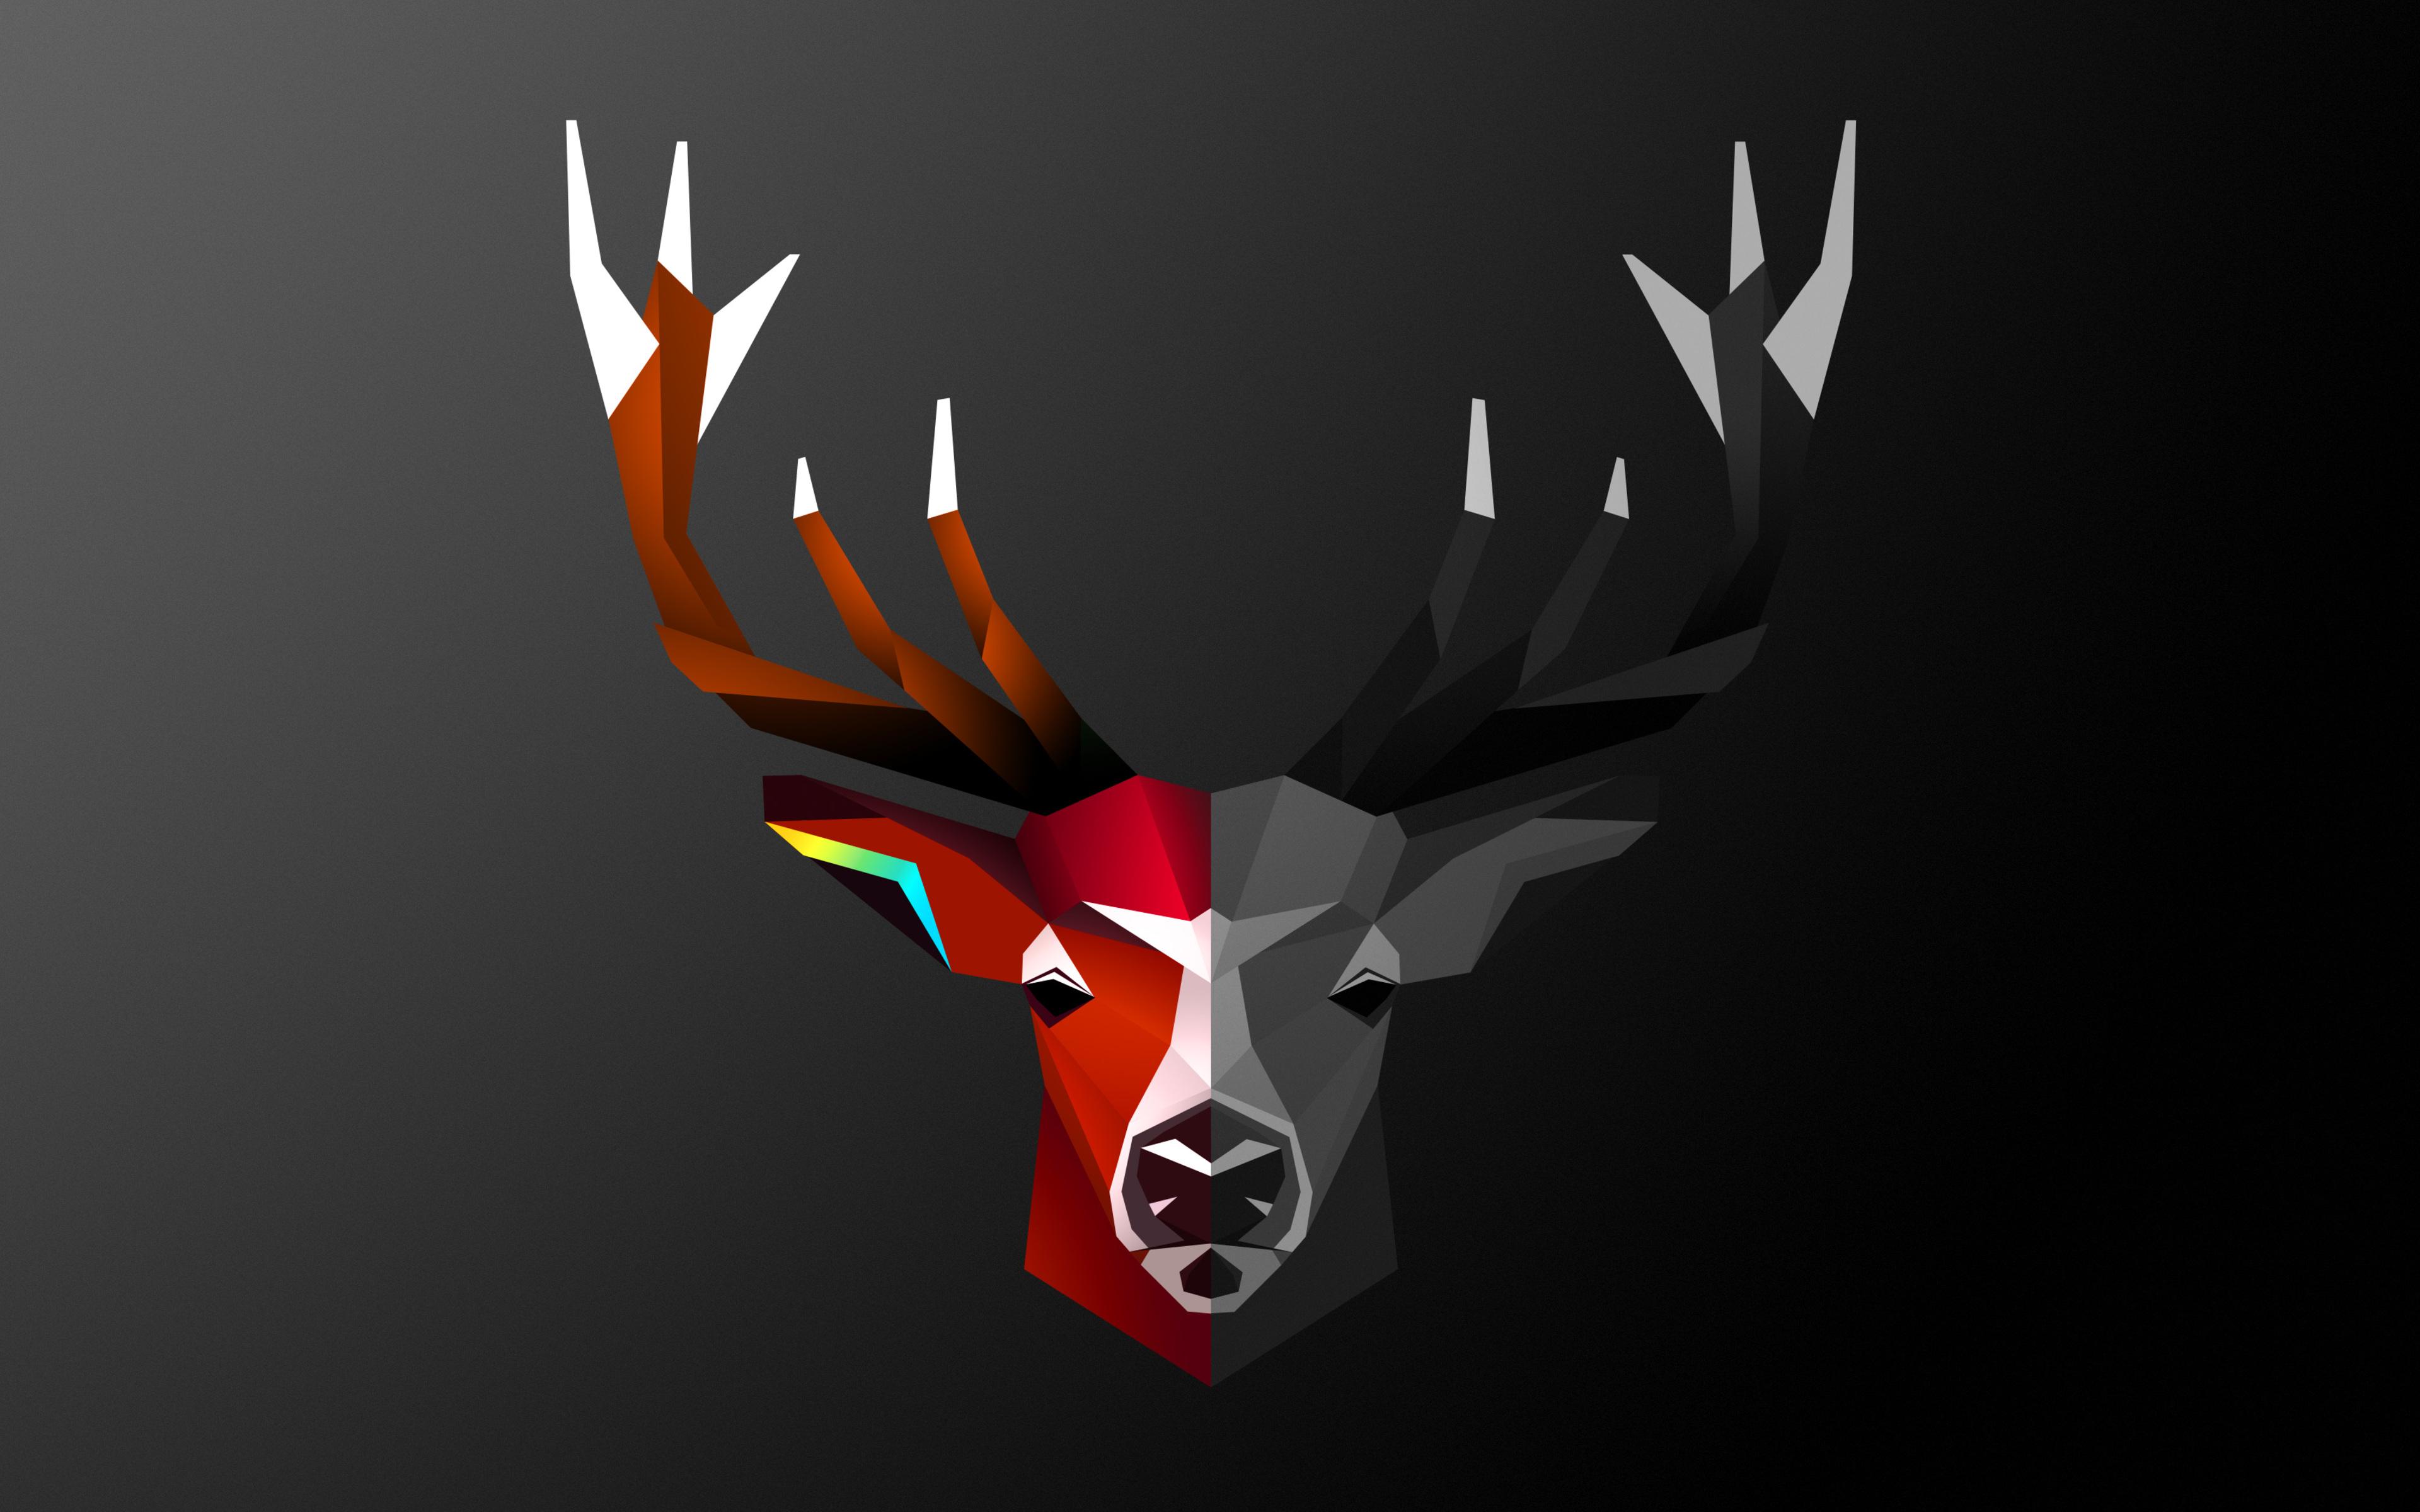 abstract-deer-4k-1d.jpg